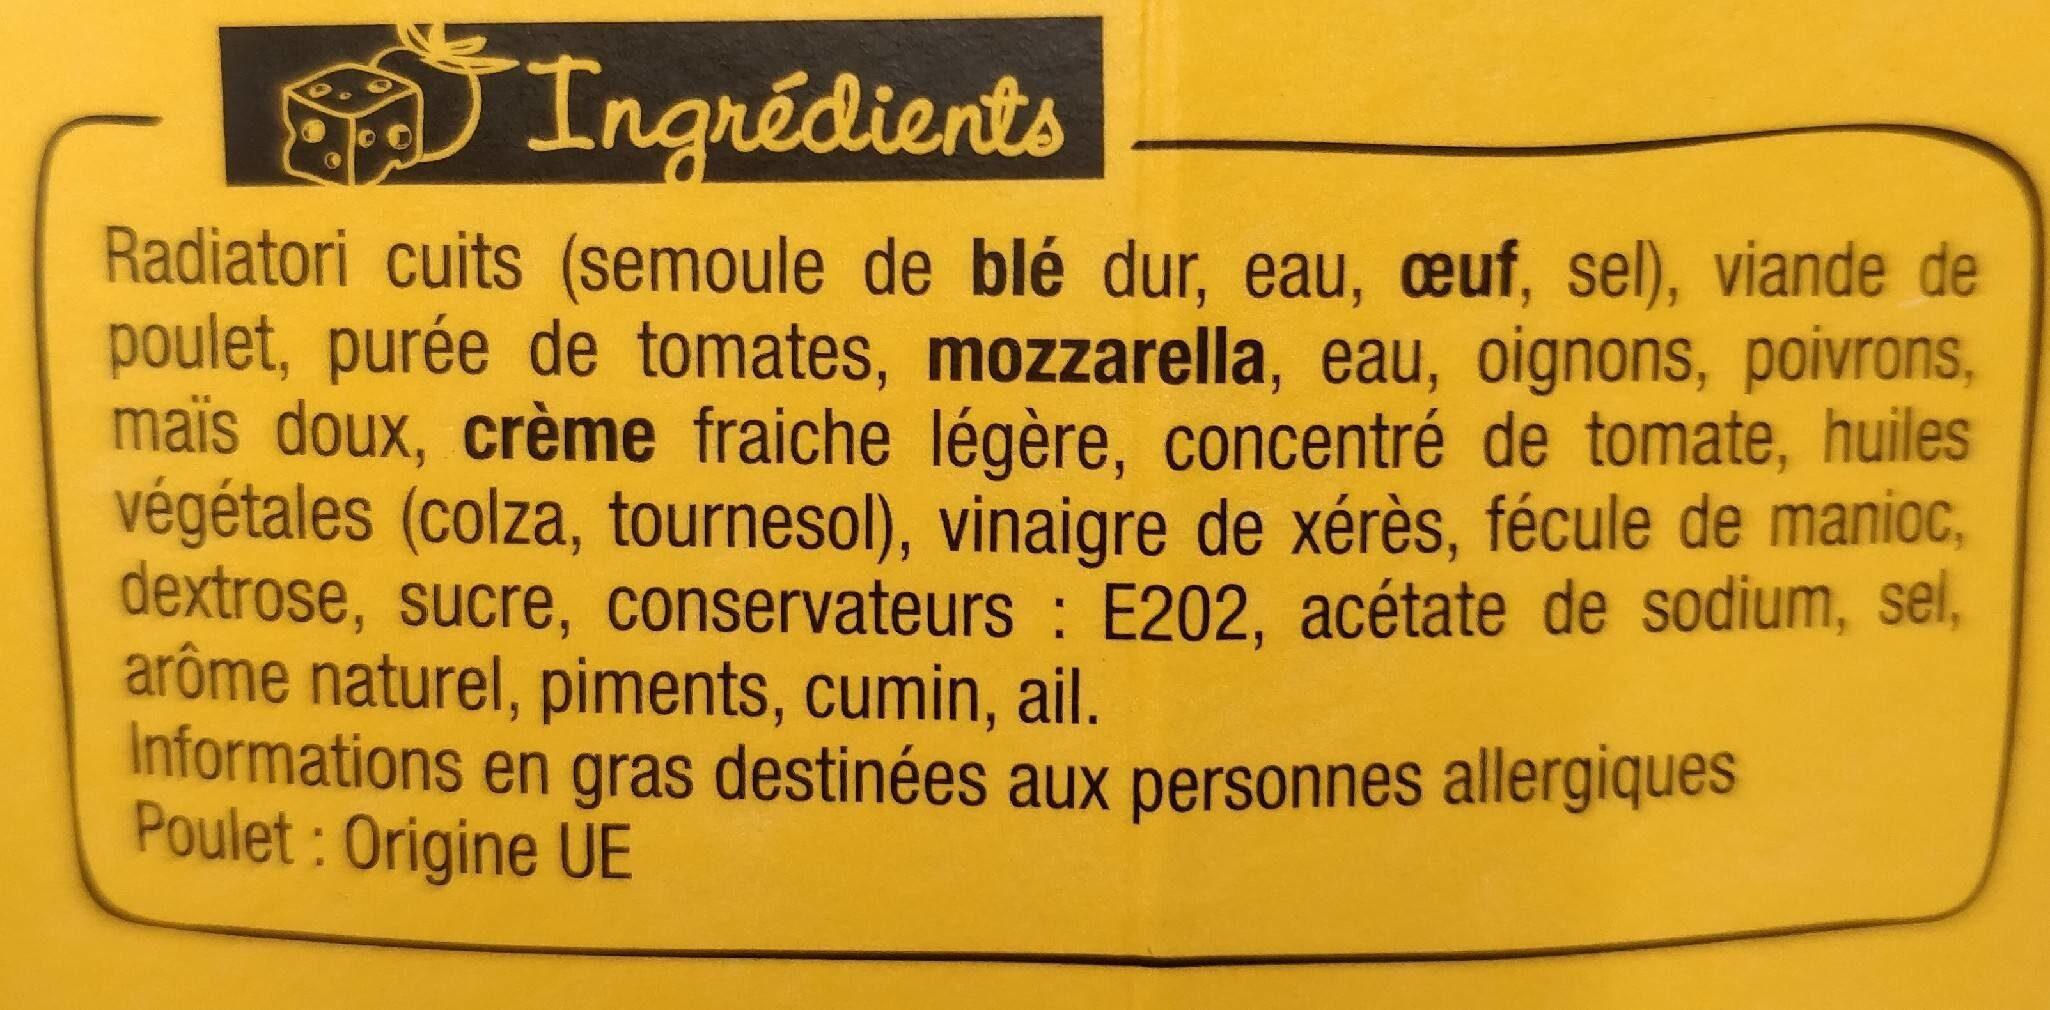 xtrembox radiatori poulet tex mex - Ingrédients - fr